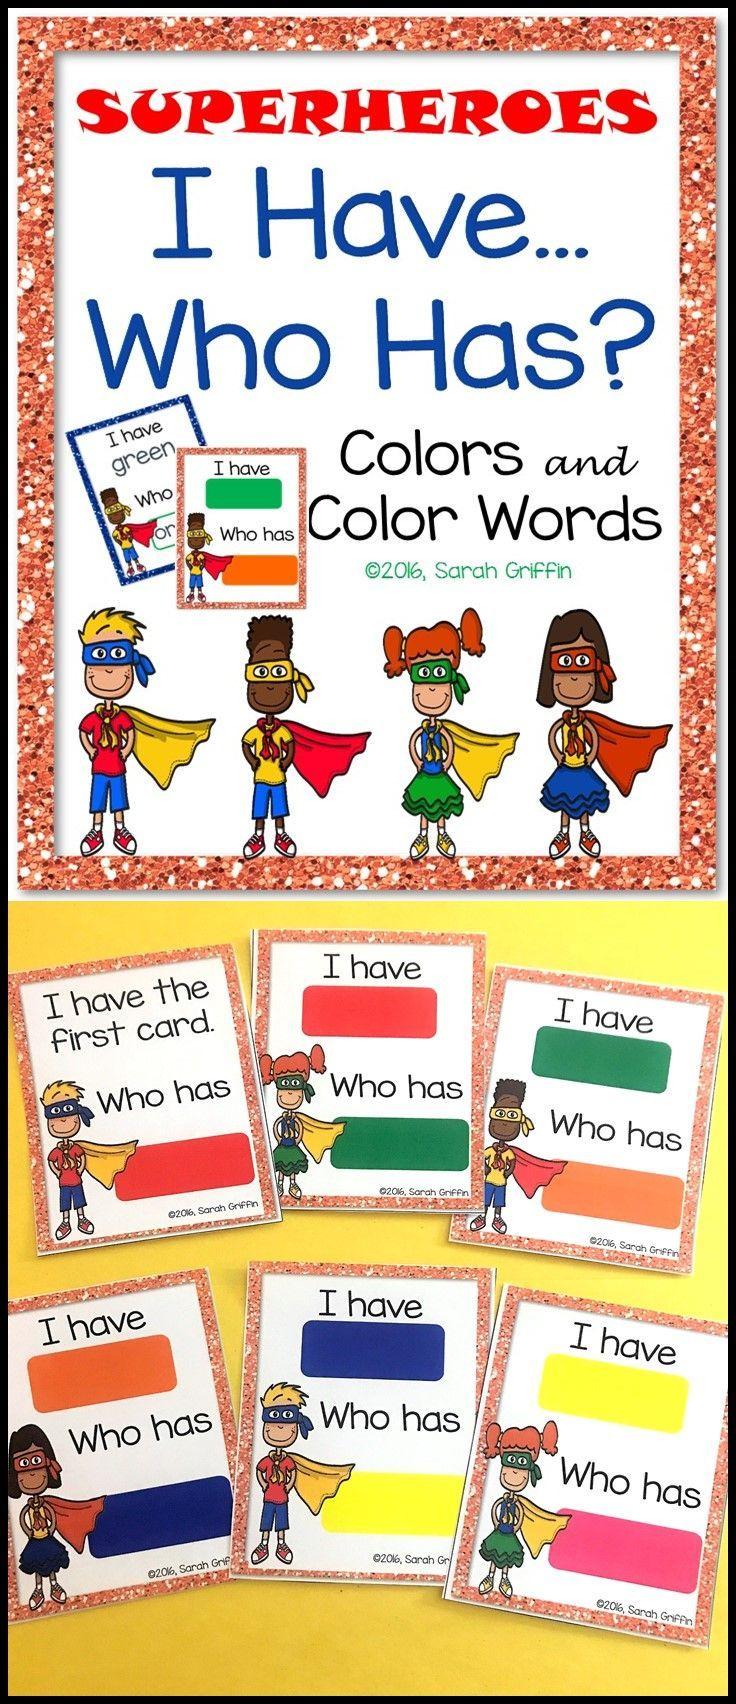 Primary color games for preschoolers - I Have Who Has Color Game Color Matching Preschool Prek Kindergarten